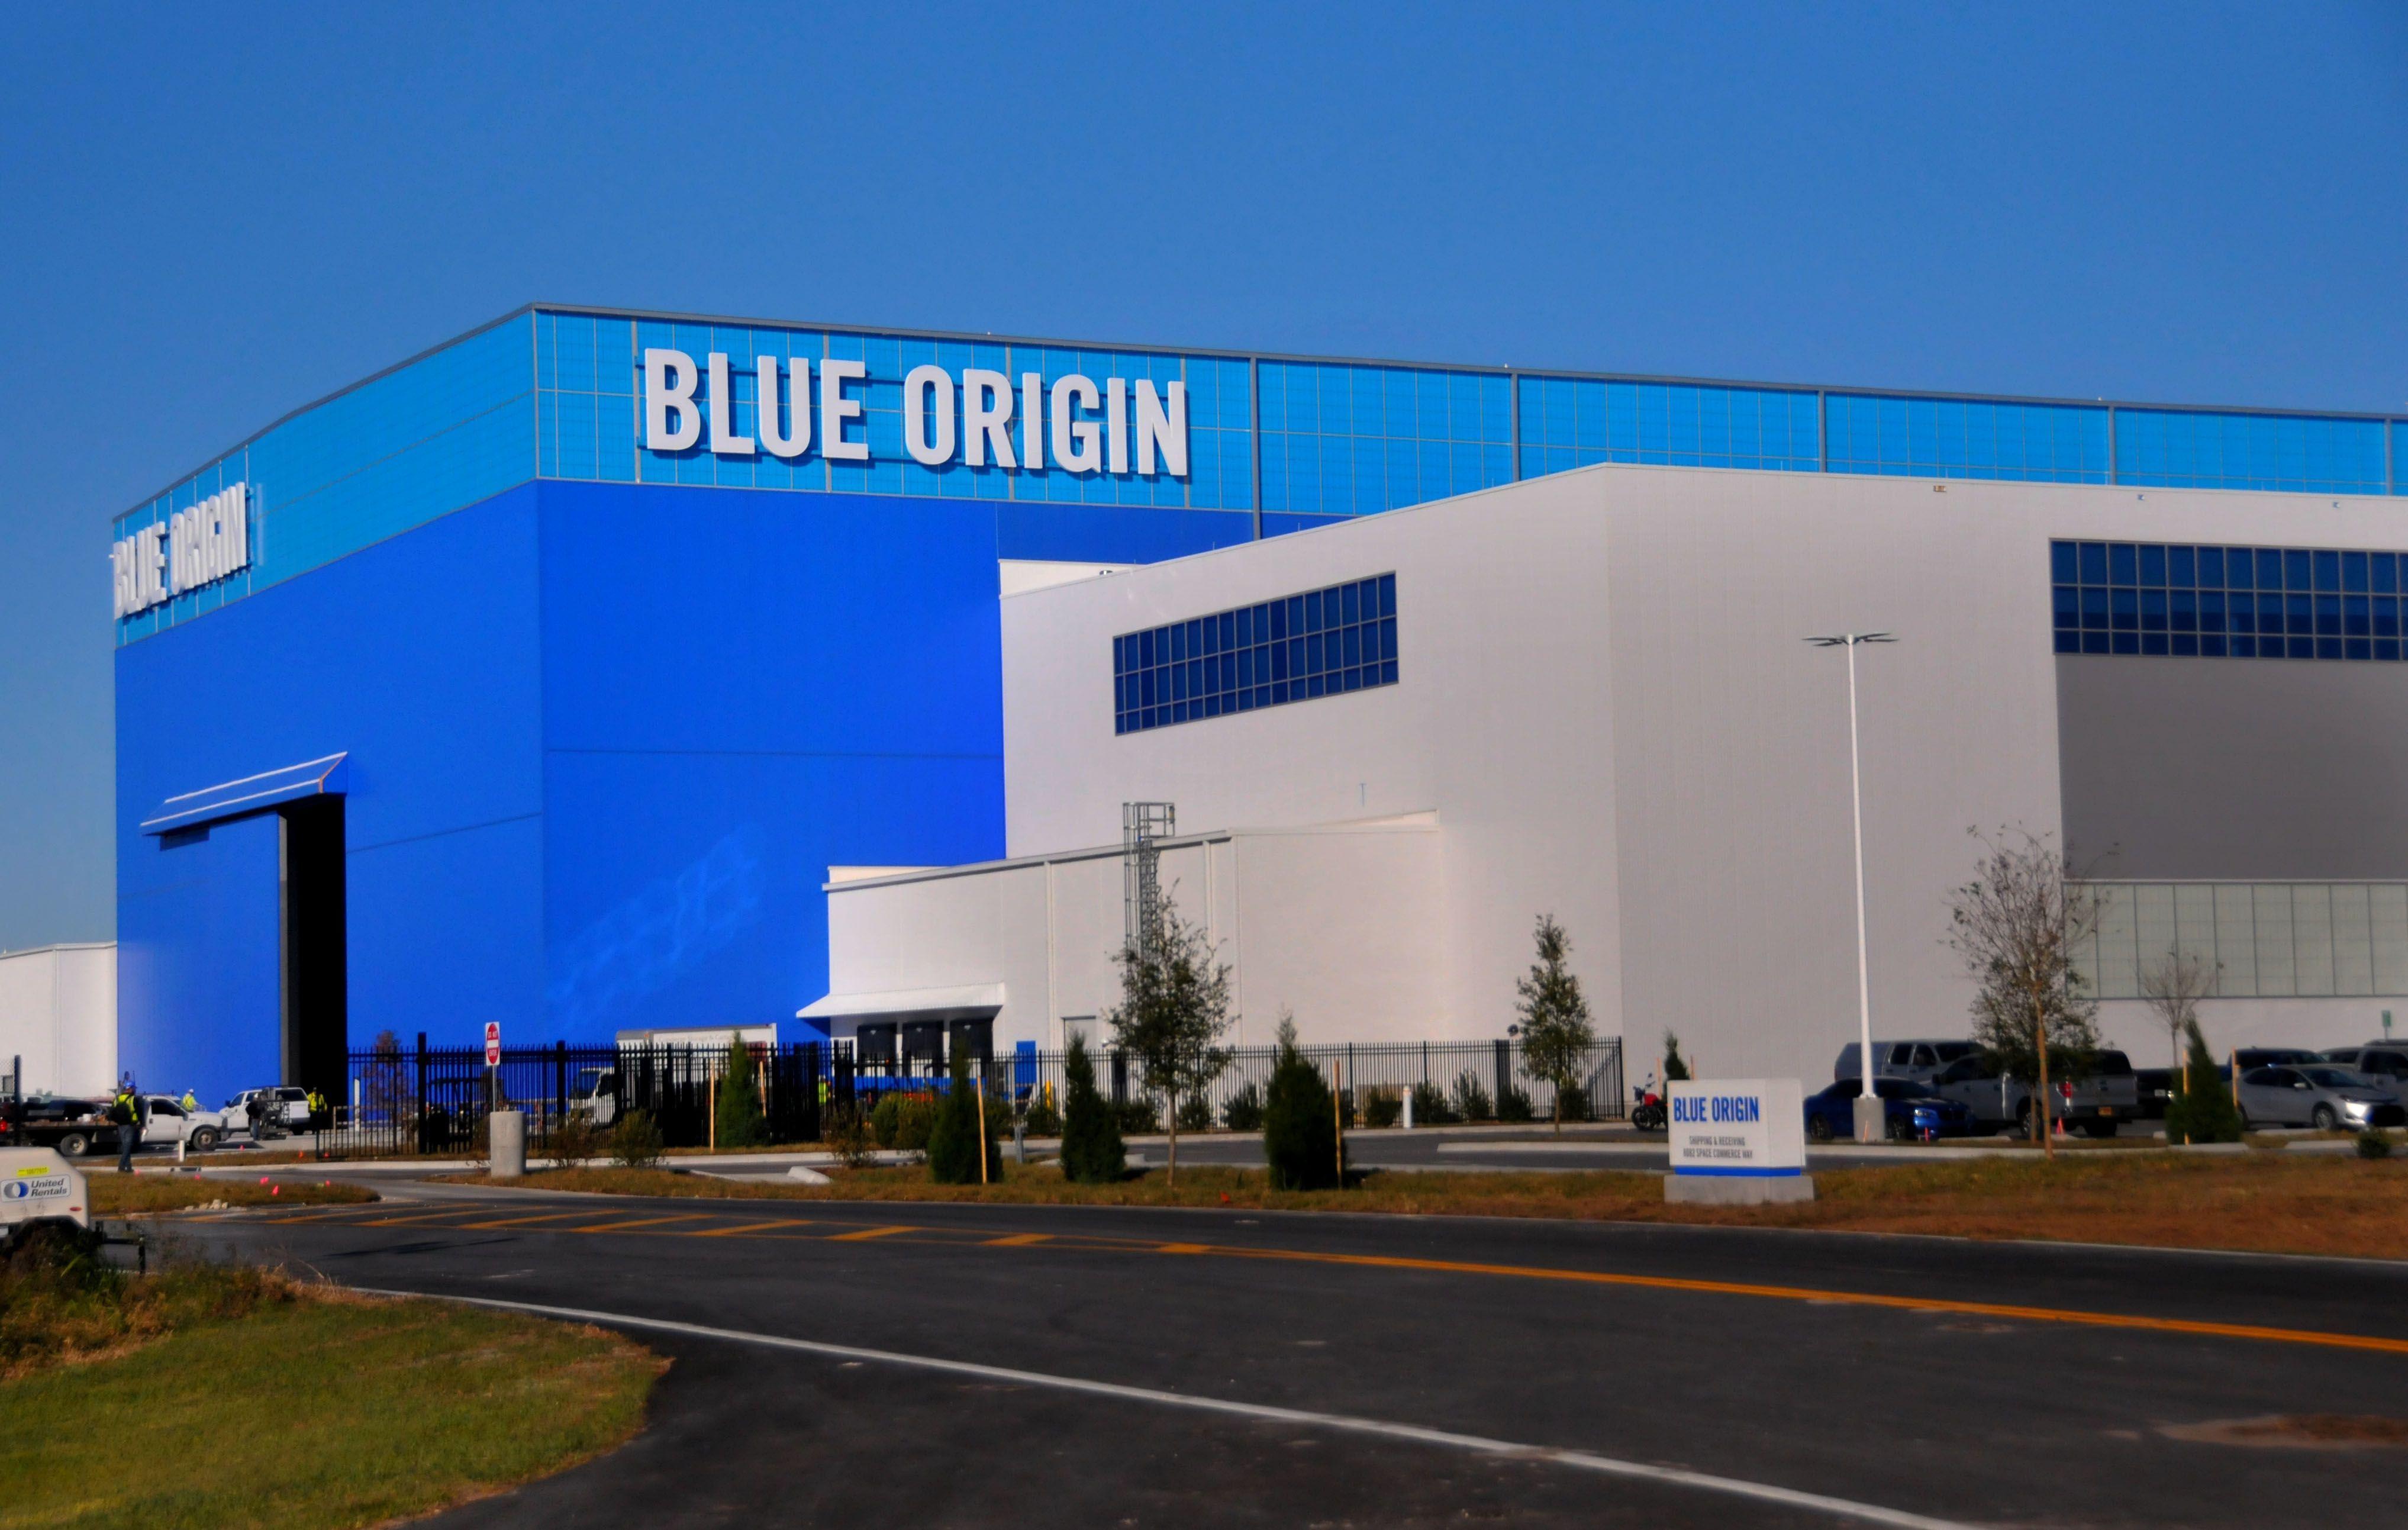 Blue Origin's New Glenn rocket factory at Kennedy Space Center's Exploration Park.